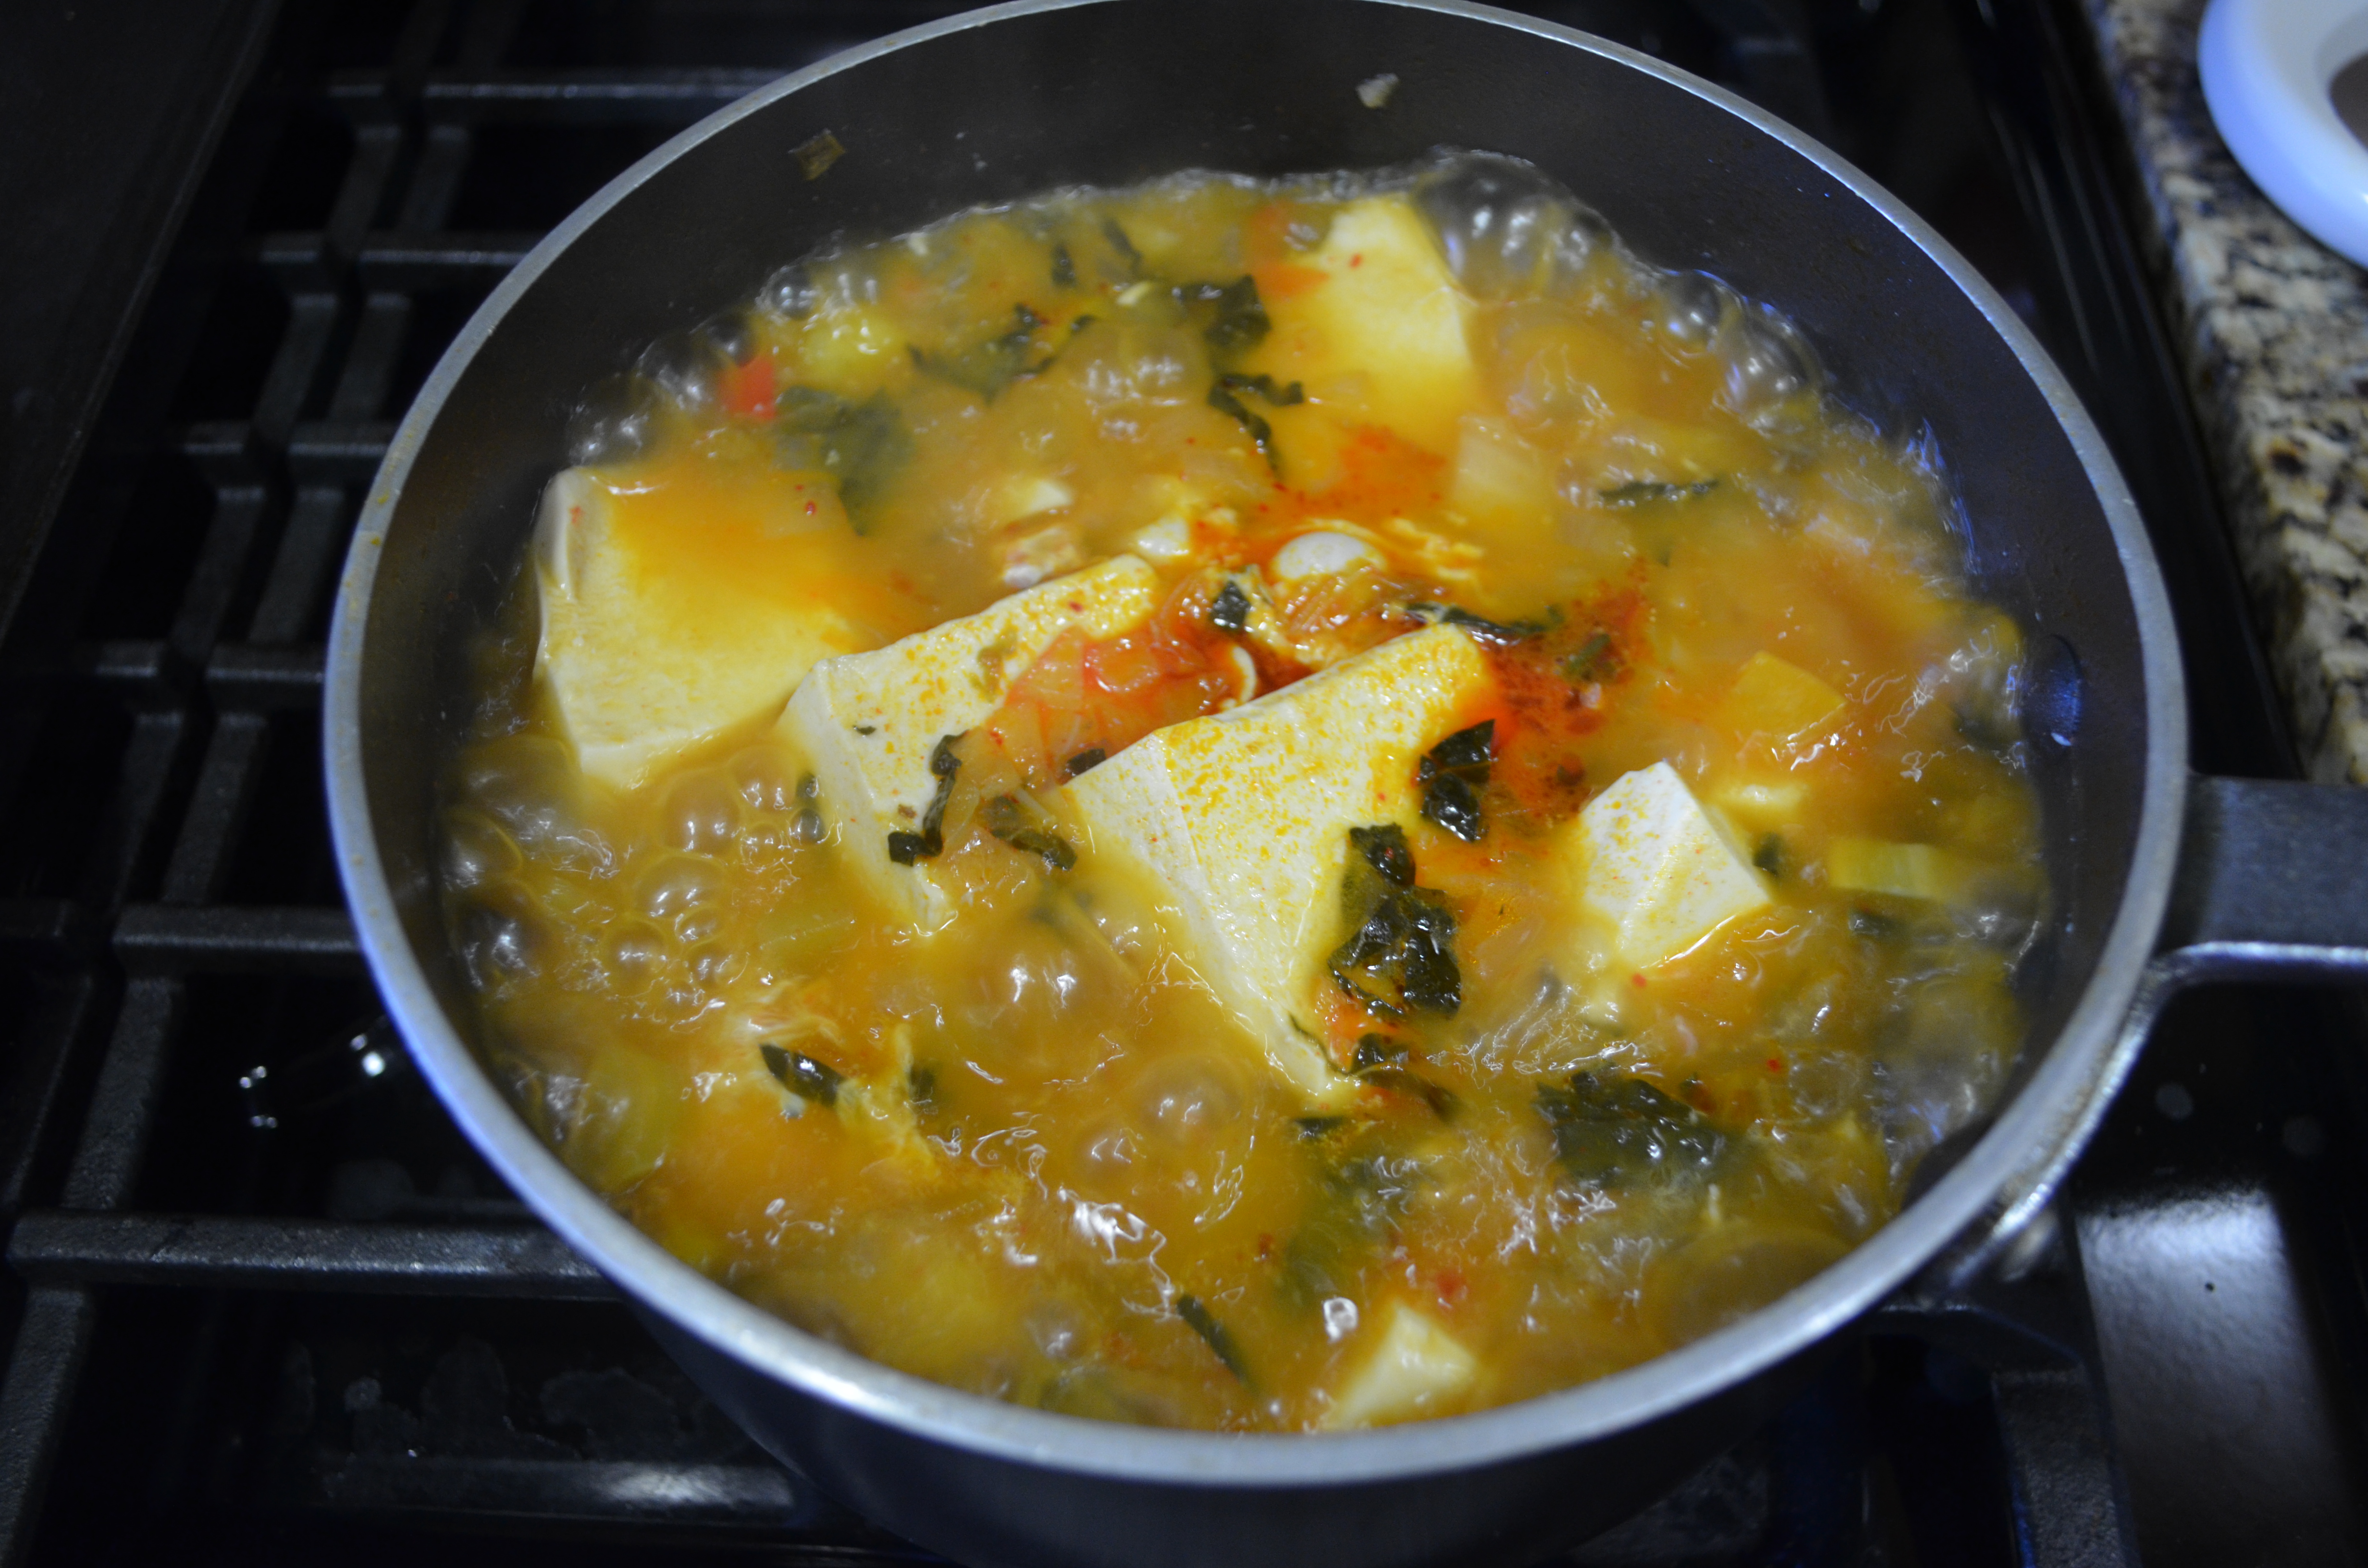 From Garden to Table: Soondubu Jjigae, Korean Soft Tofu ...